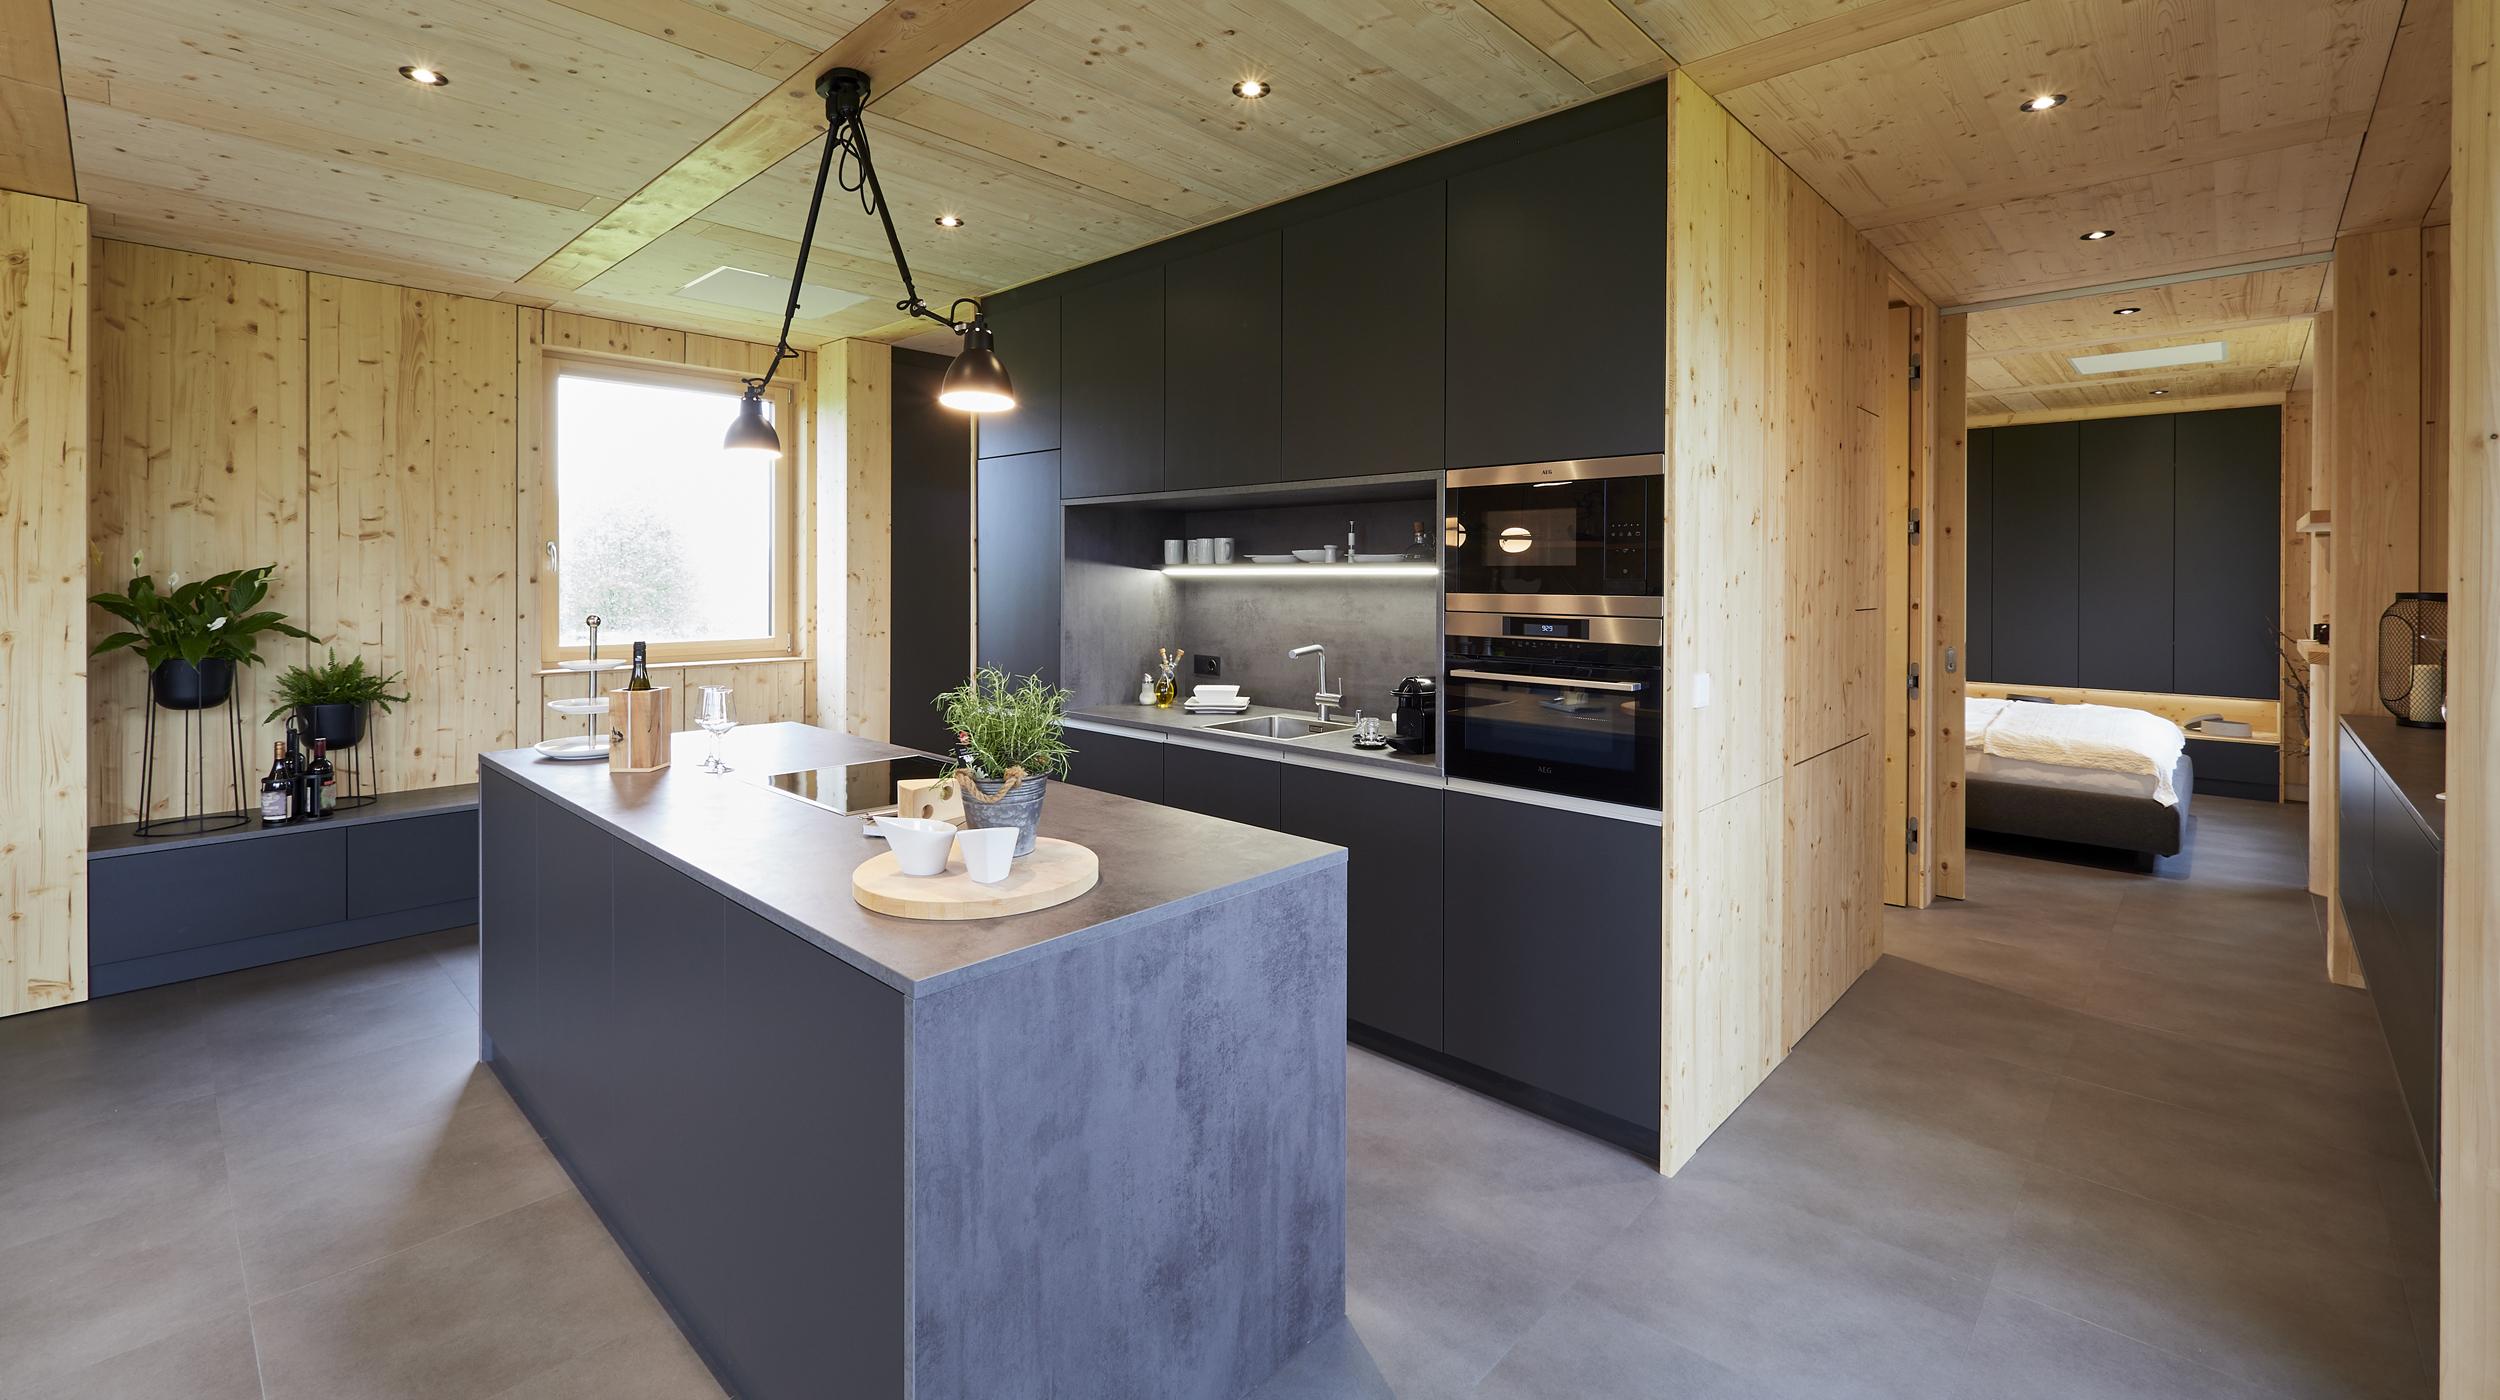 ZiKK 2.0 Musterhaus Vitis - Blick in die Wohnküche